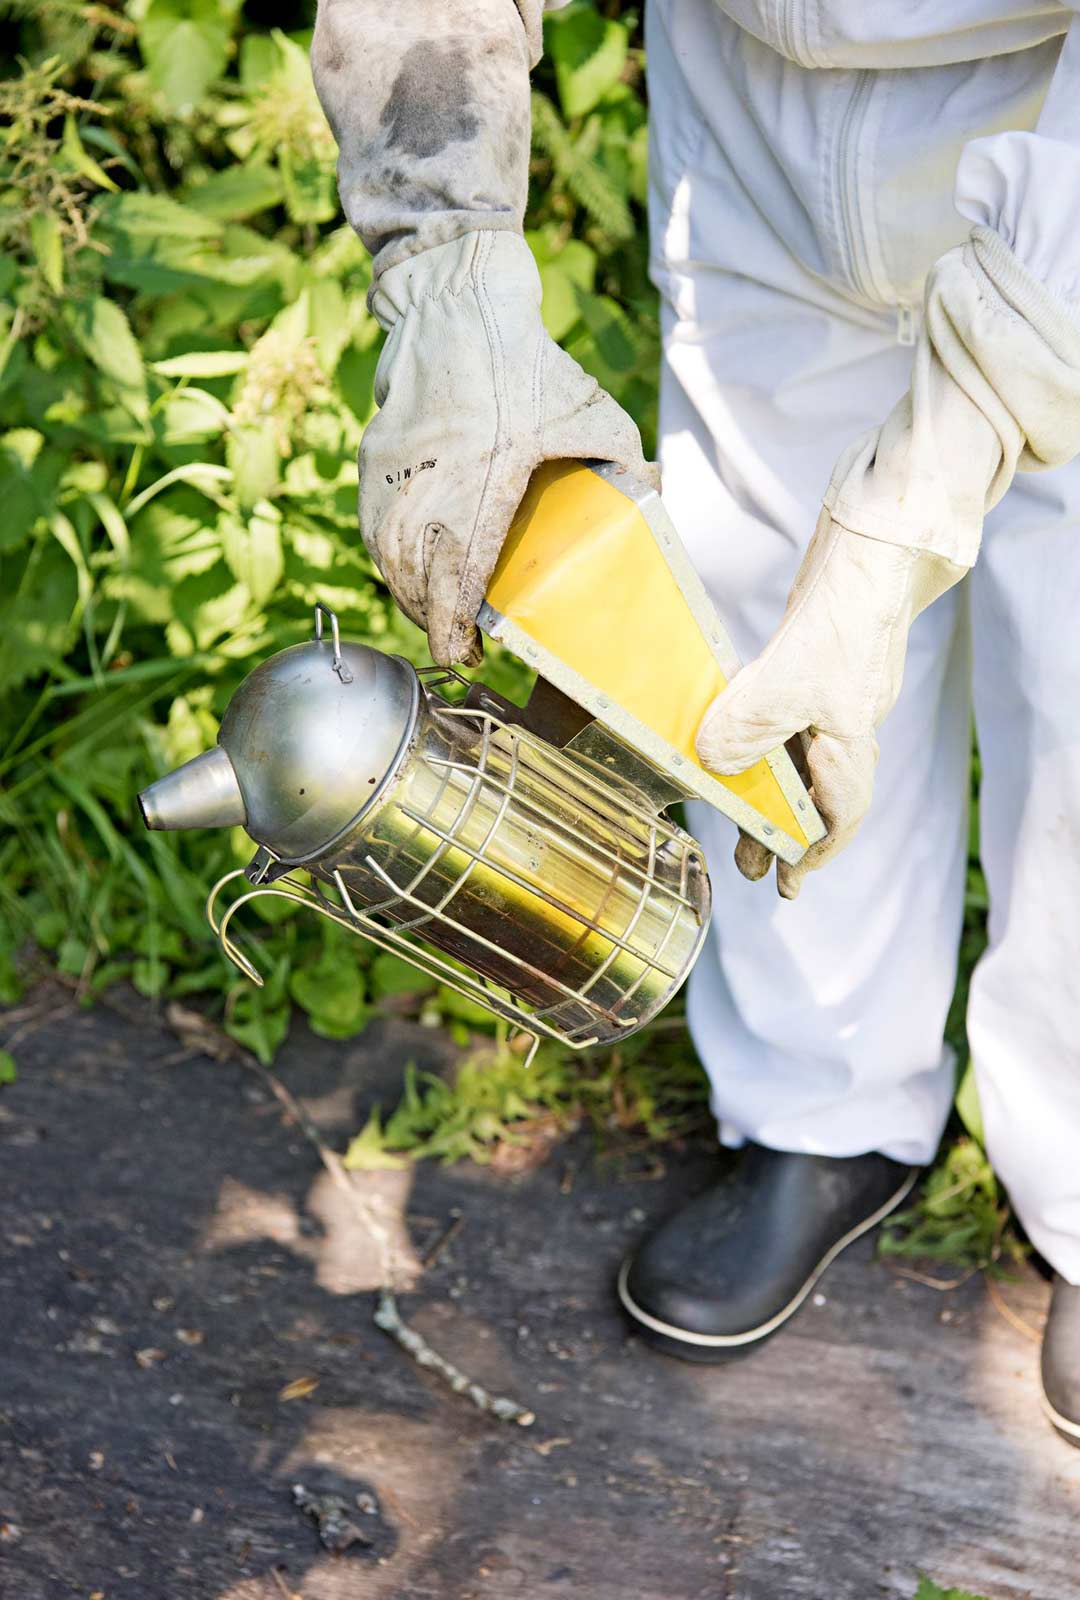 Mehiläisille annetaan savua savuttimella, jolloin ne rauhoittuvat.